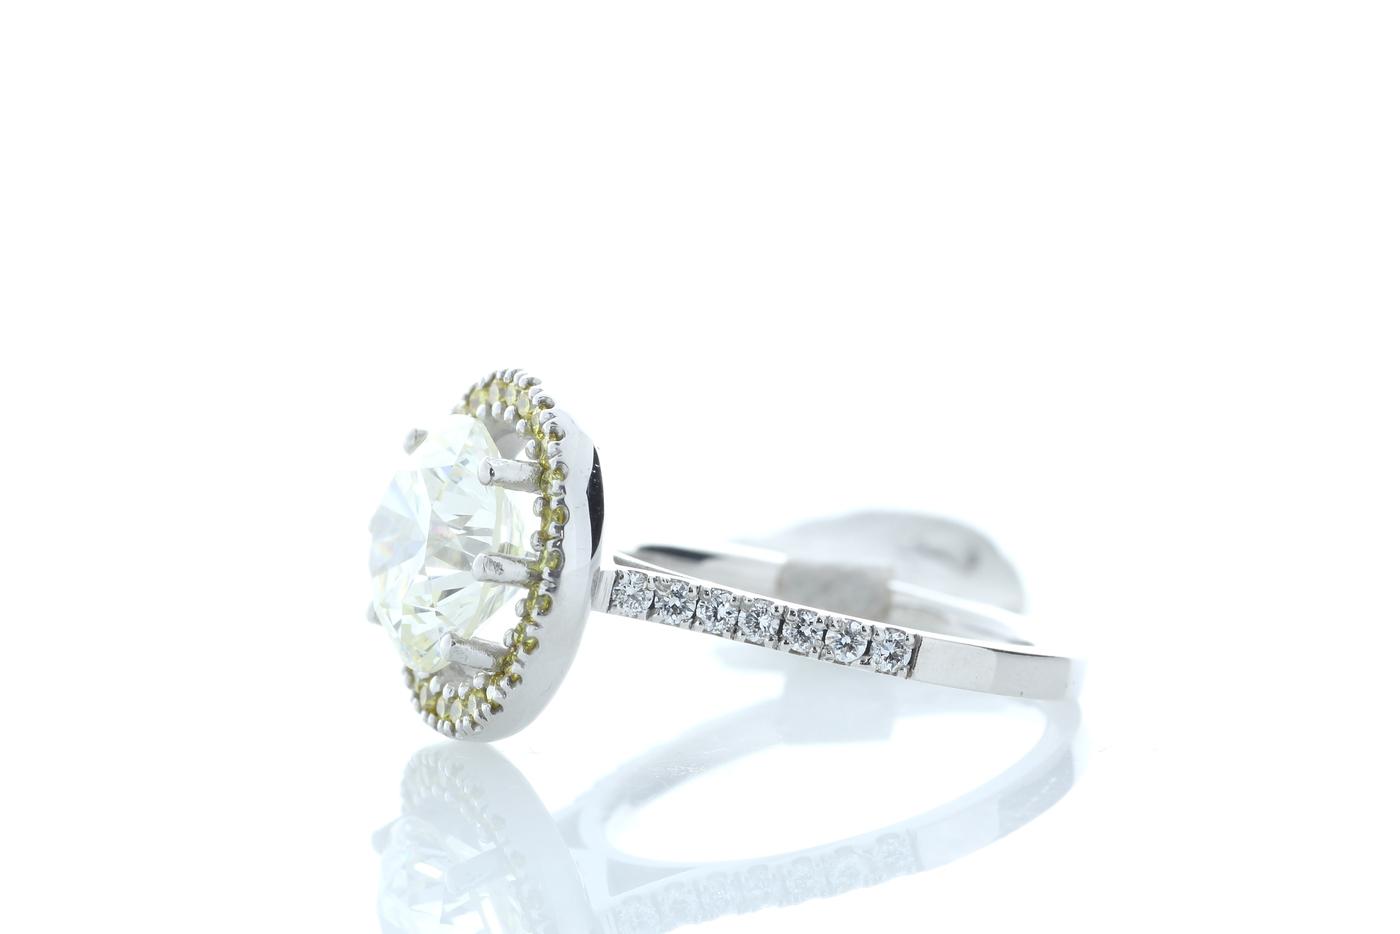 18ct White Gold Halo Set Diamond Ring 3.43 Carats - Image 2 of 5